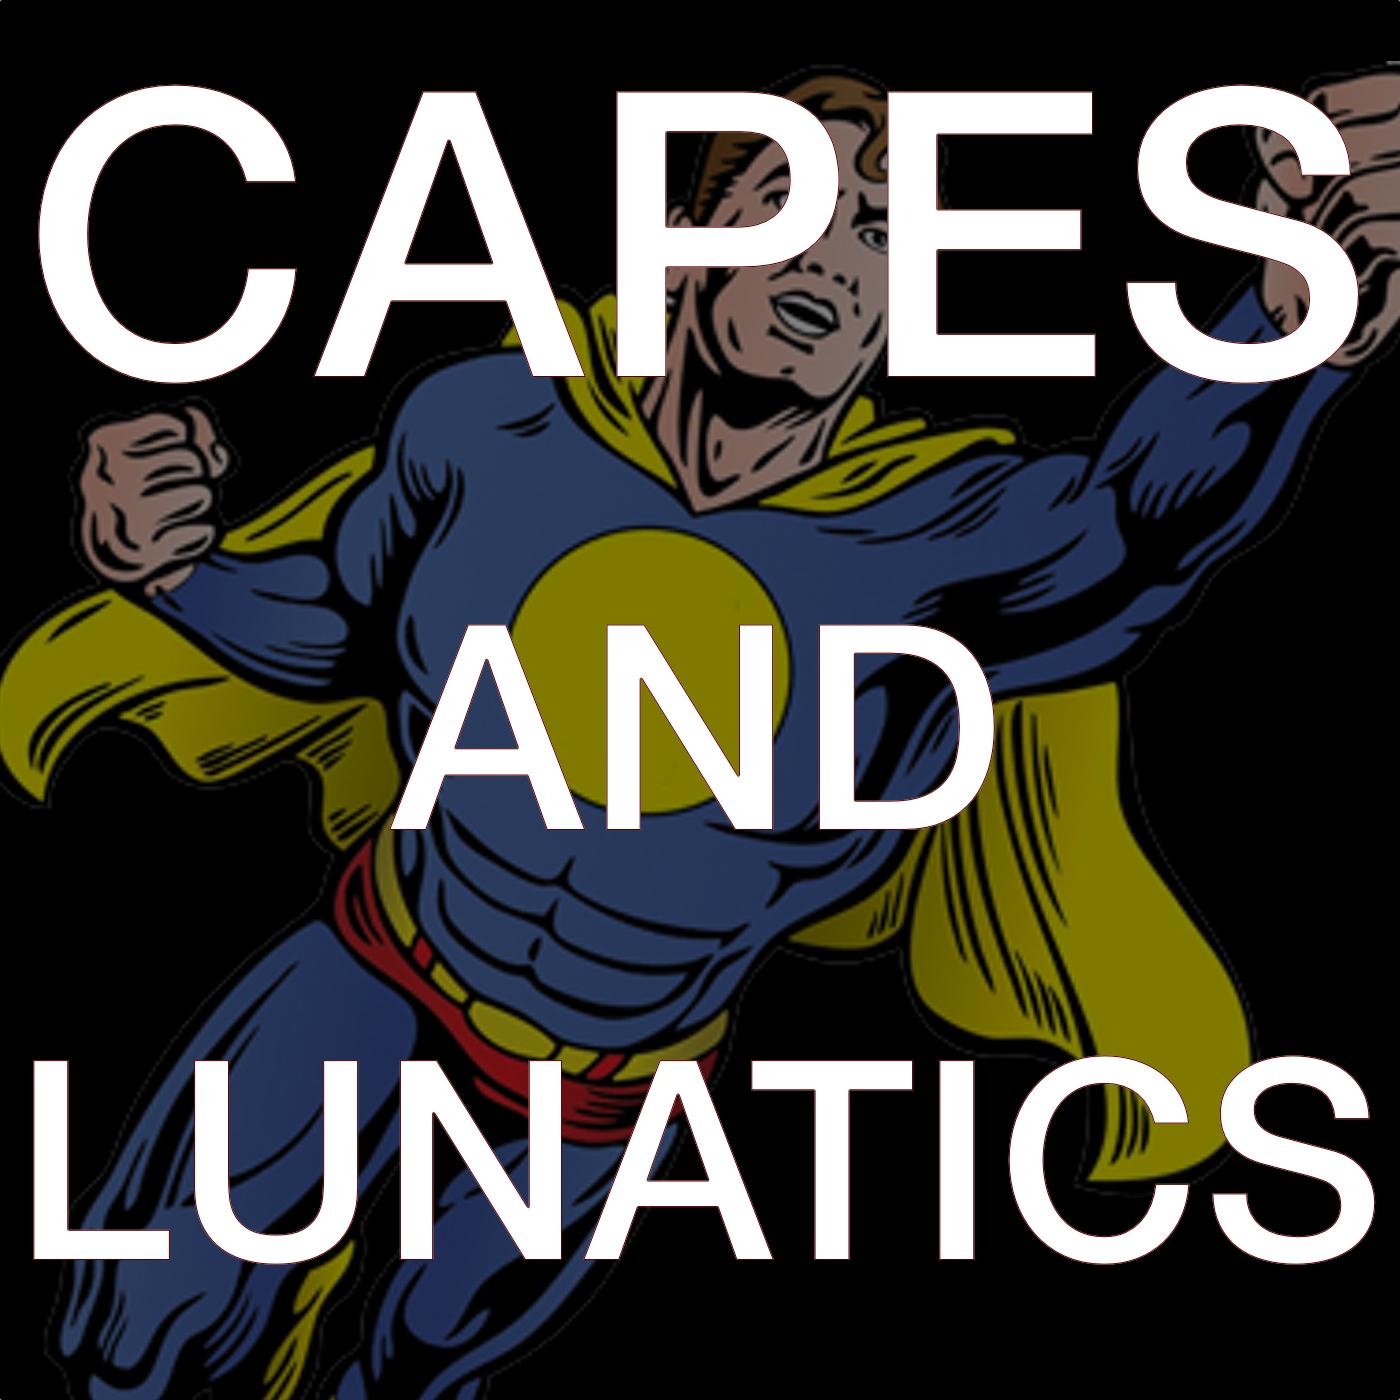 Capes and Lunatics Logo 1400x1400.jpg